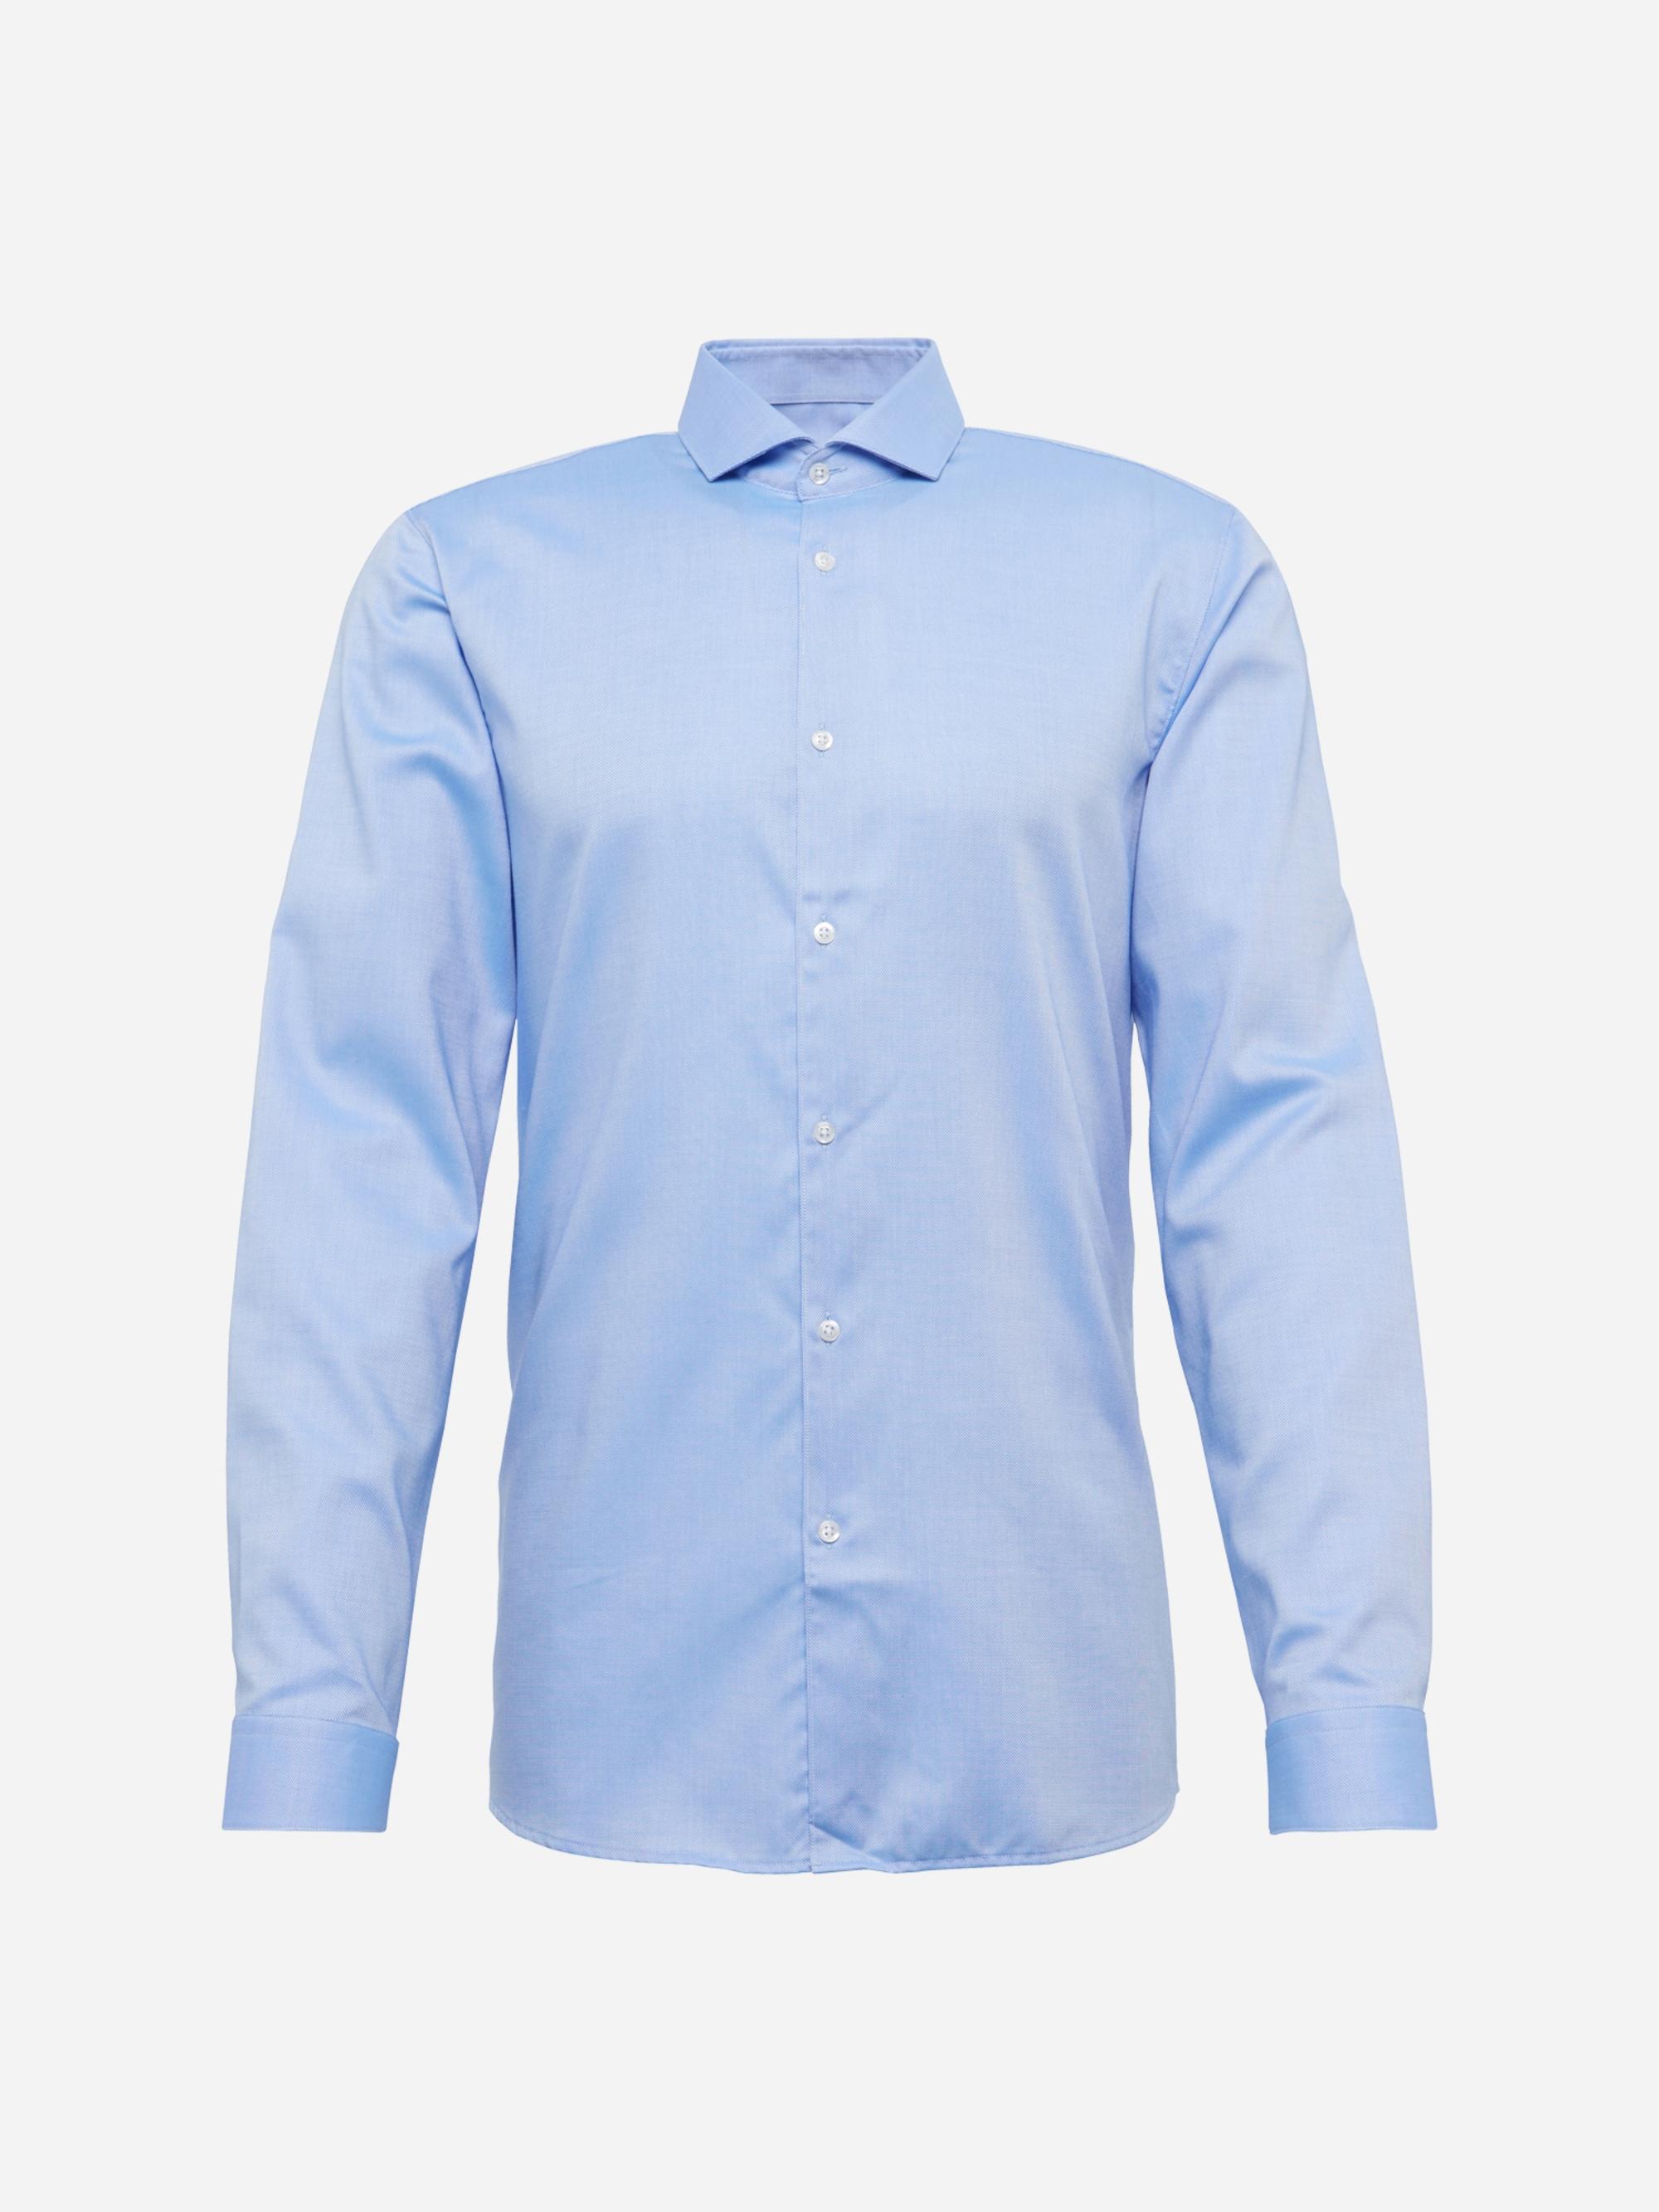 Image of Business-Hemd mit Haifisch-Kragen ´Erriko´